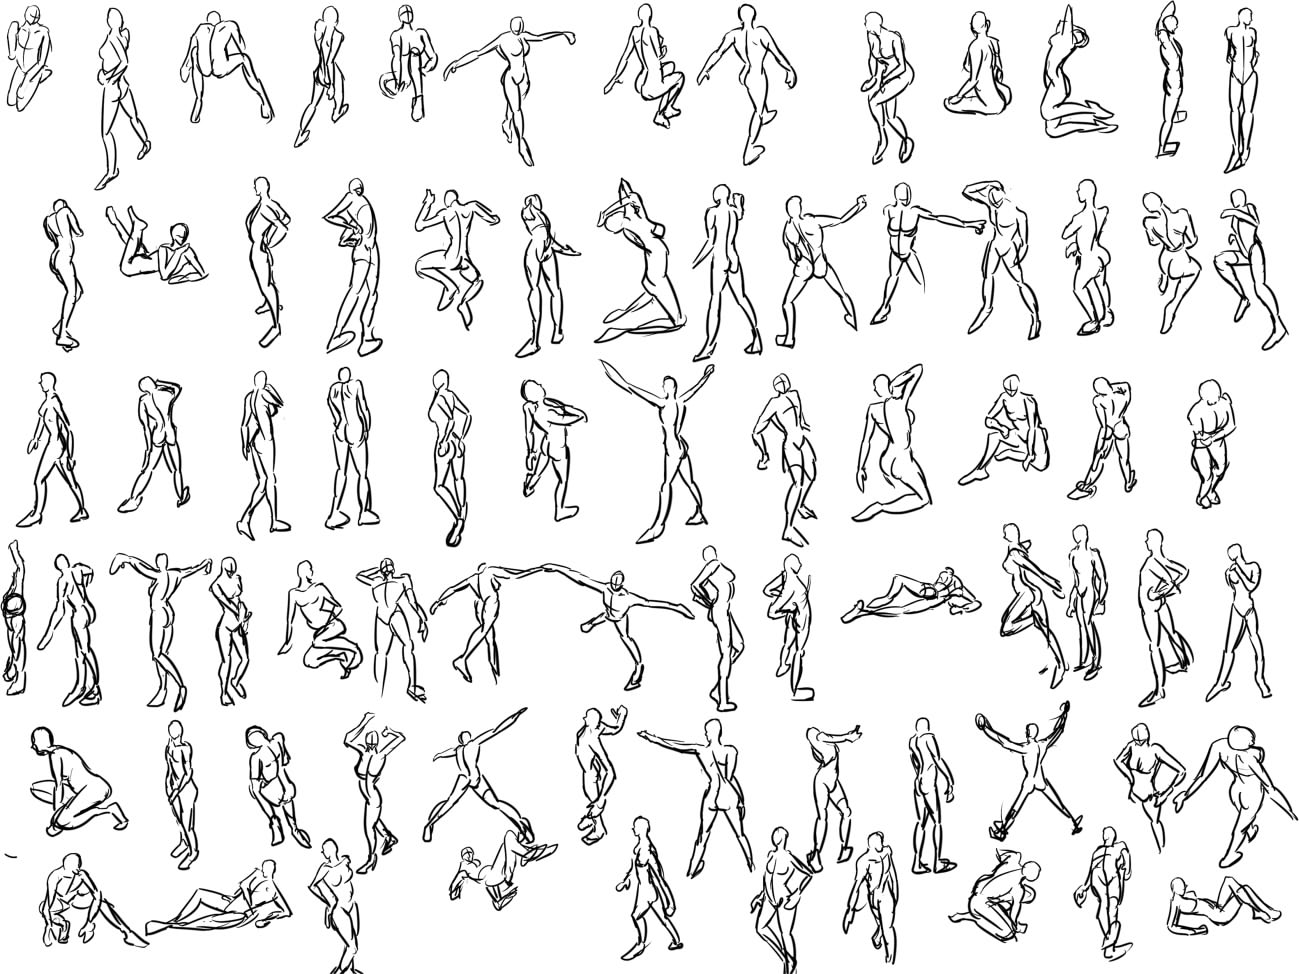 drawing30_08.jpg